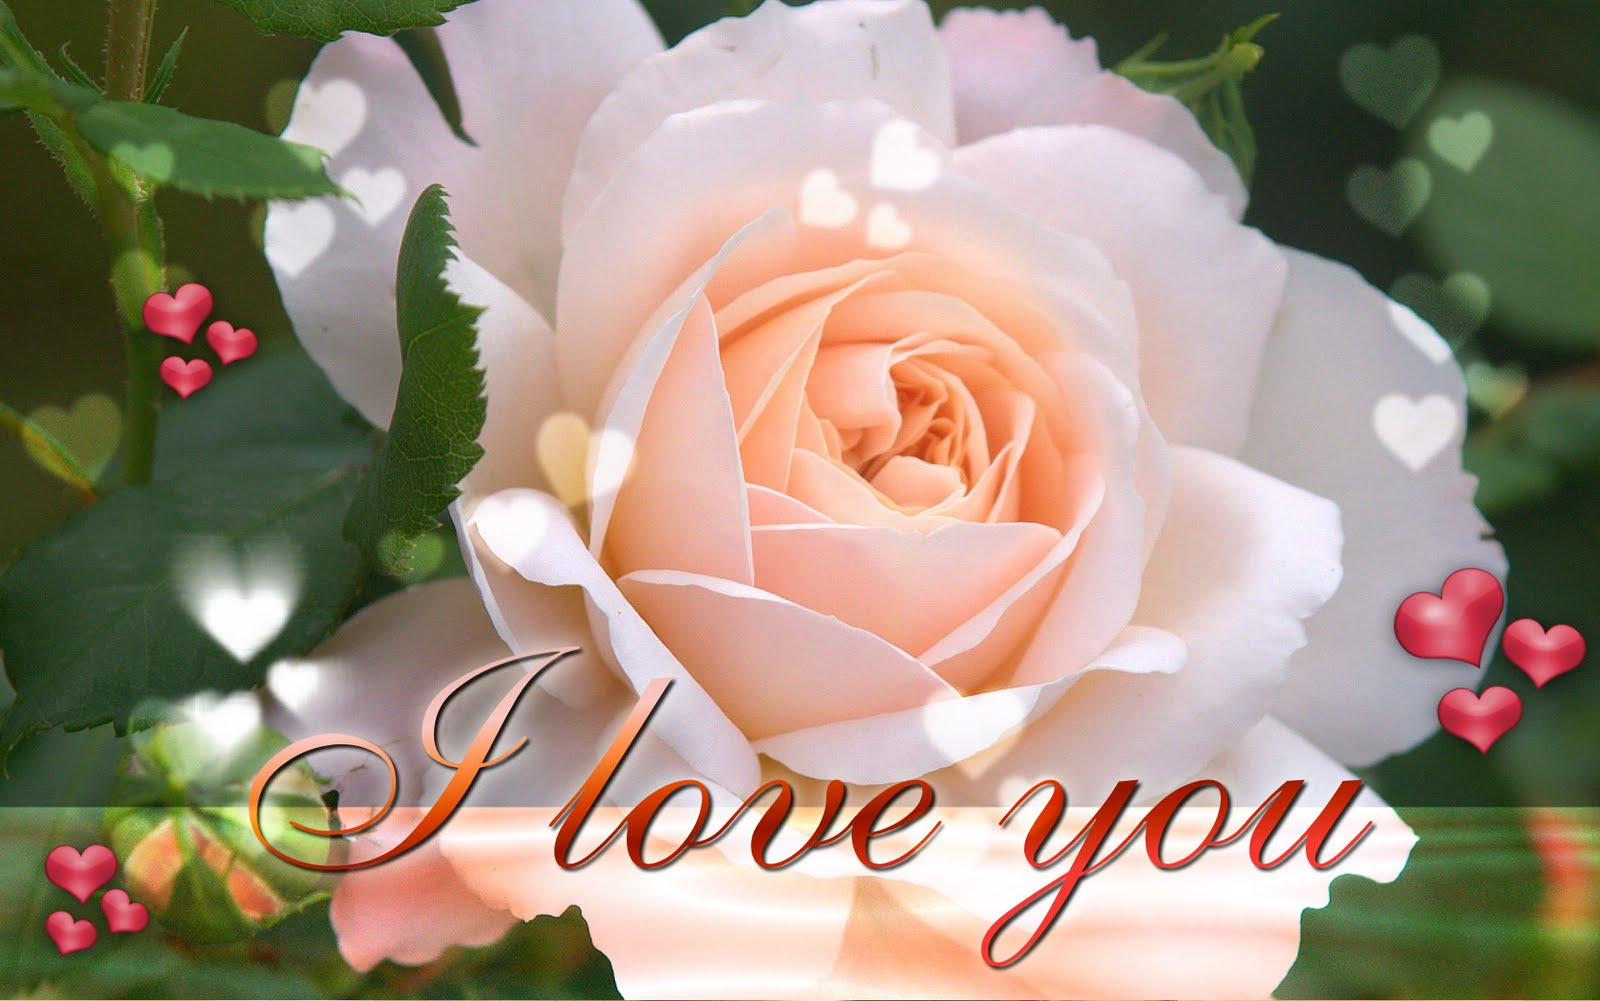 http://2.bp.blogspot.com/_71FCCUE5x3g/S9o8inMfryI/AAAAAAAAAHA/0Bb6vHttPGk/s1600/i-love-you-ecard-wallpaper-22.jpg